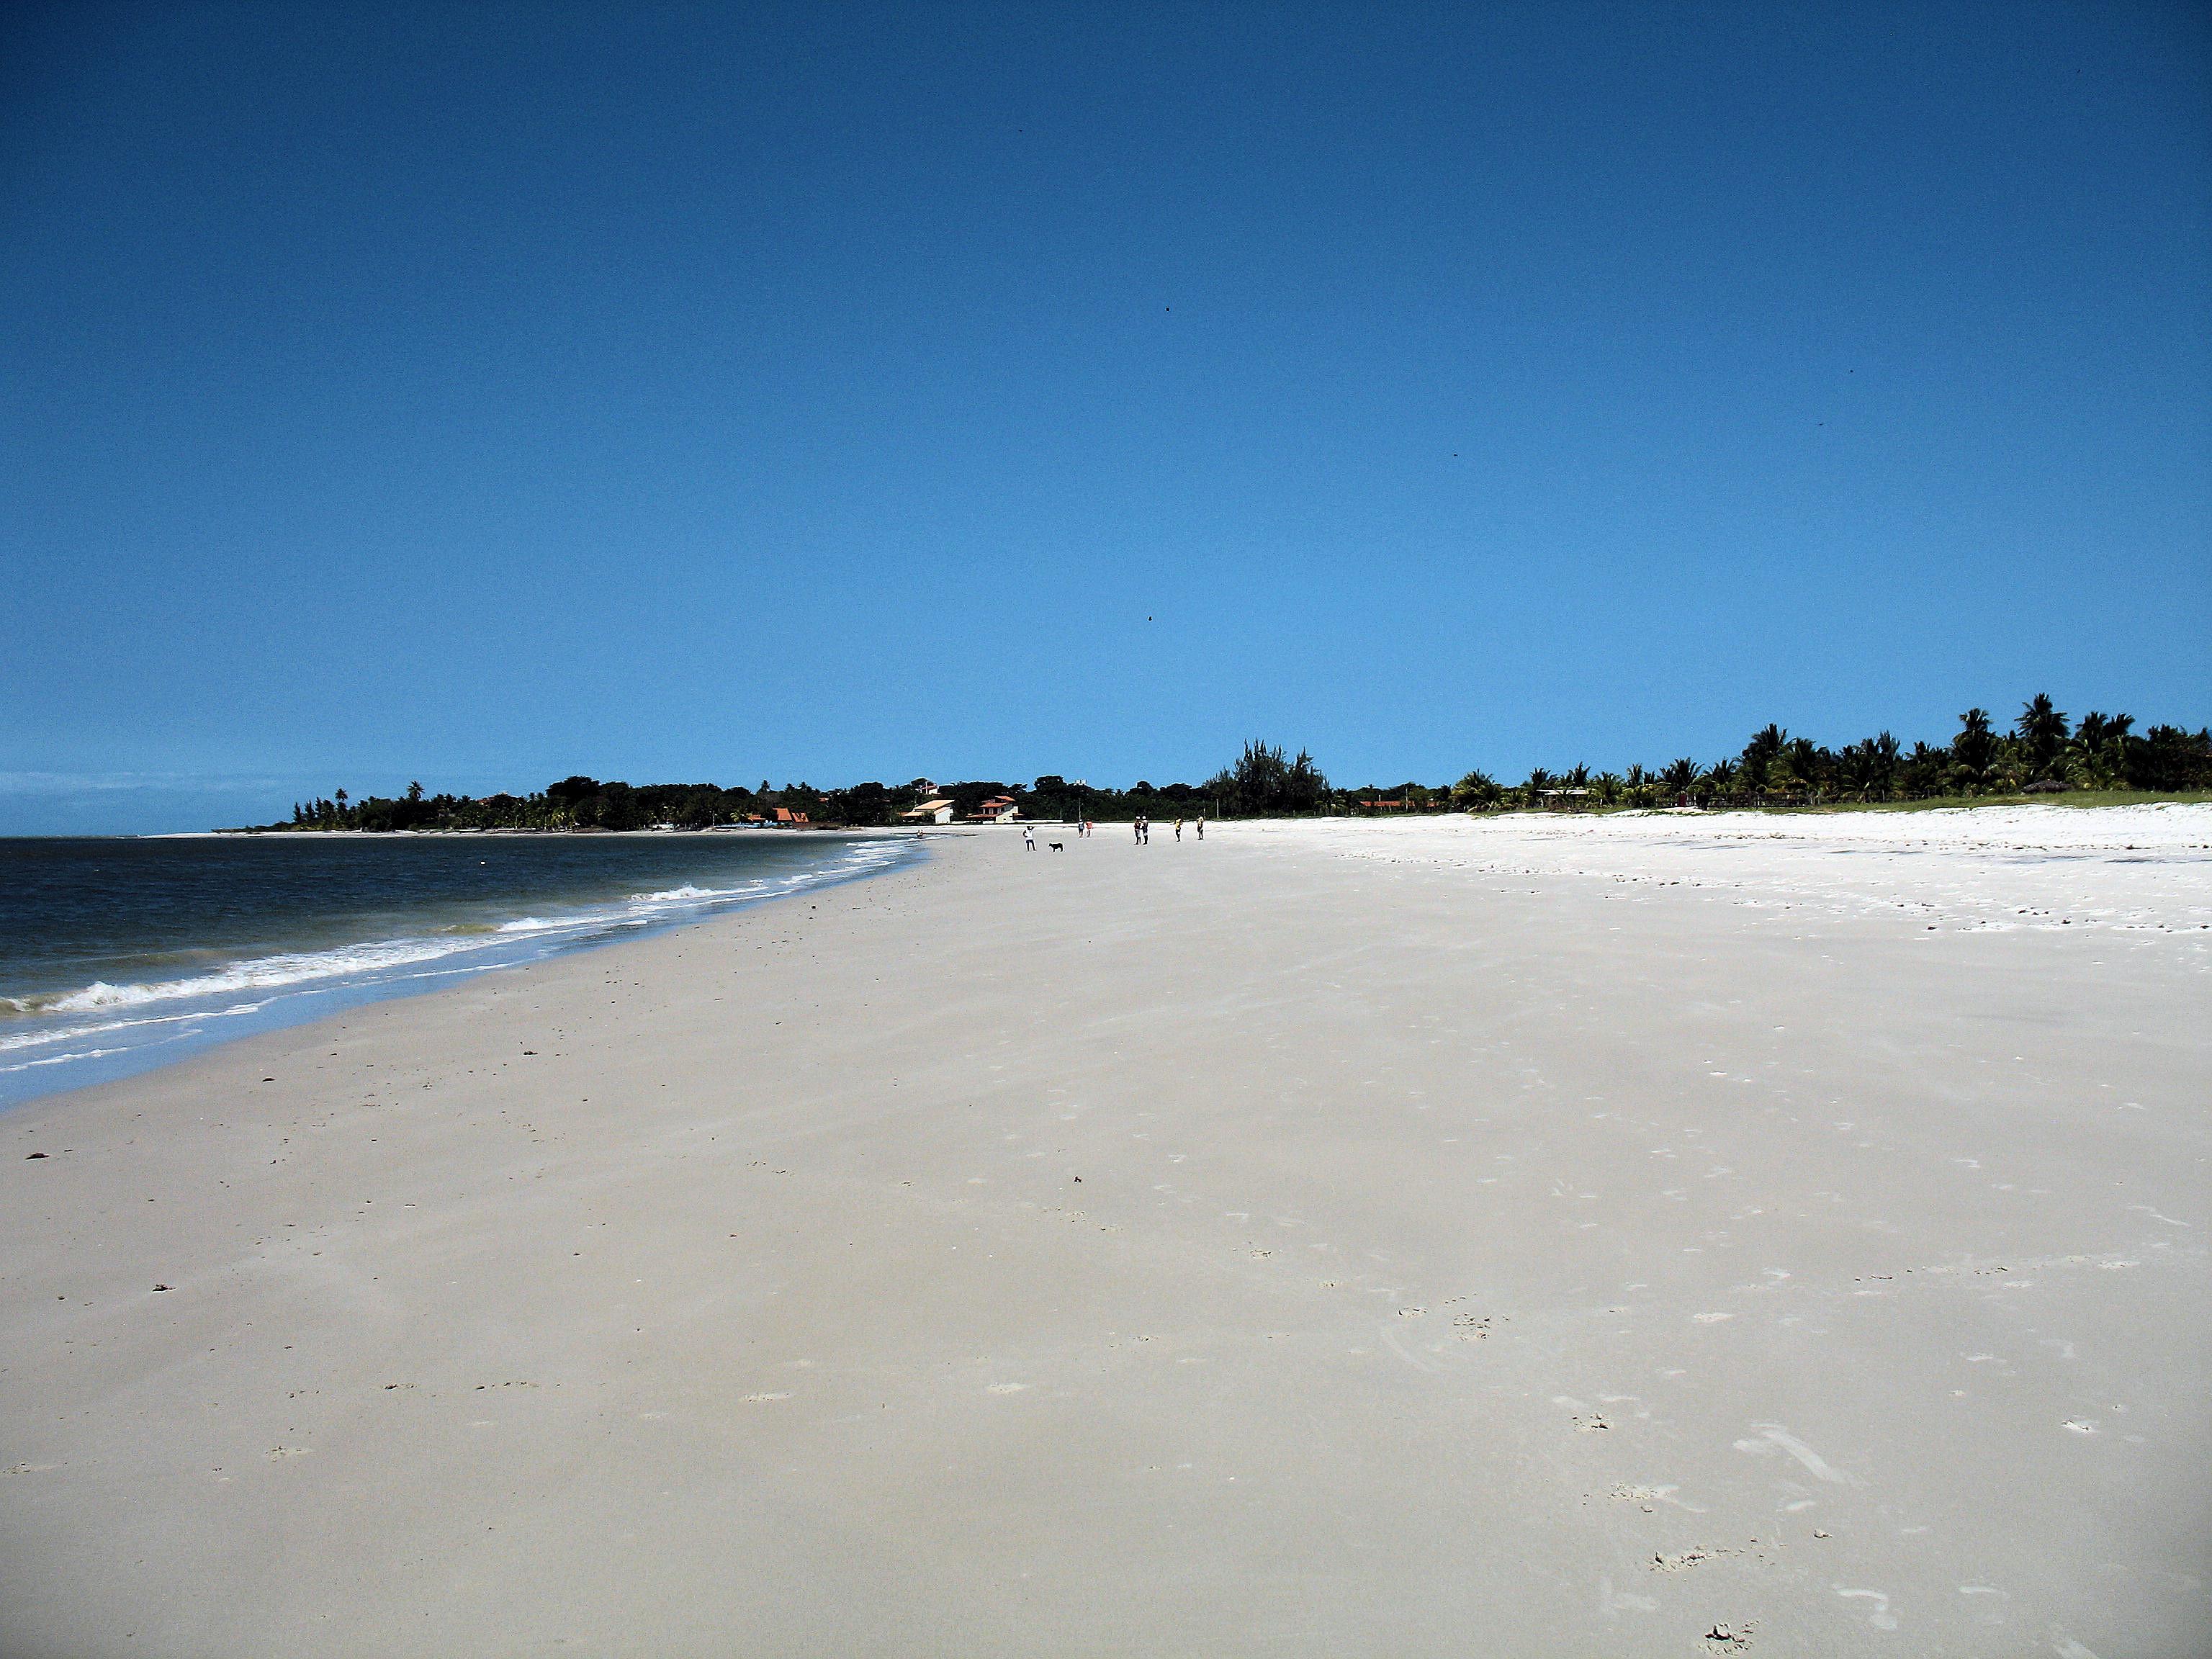 Long-distance shot of one of Itamaraca's white-sand beaches